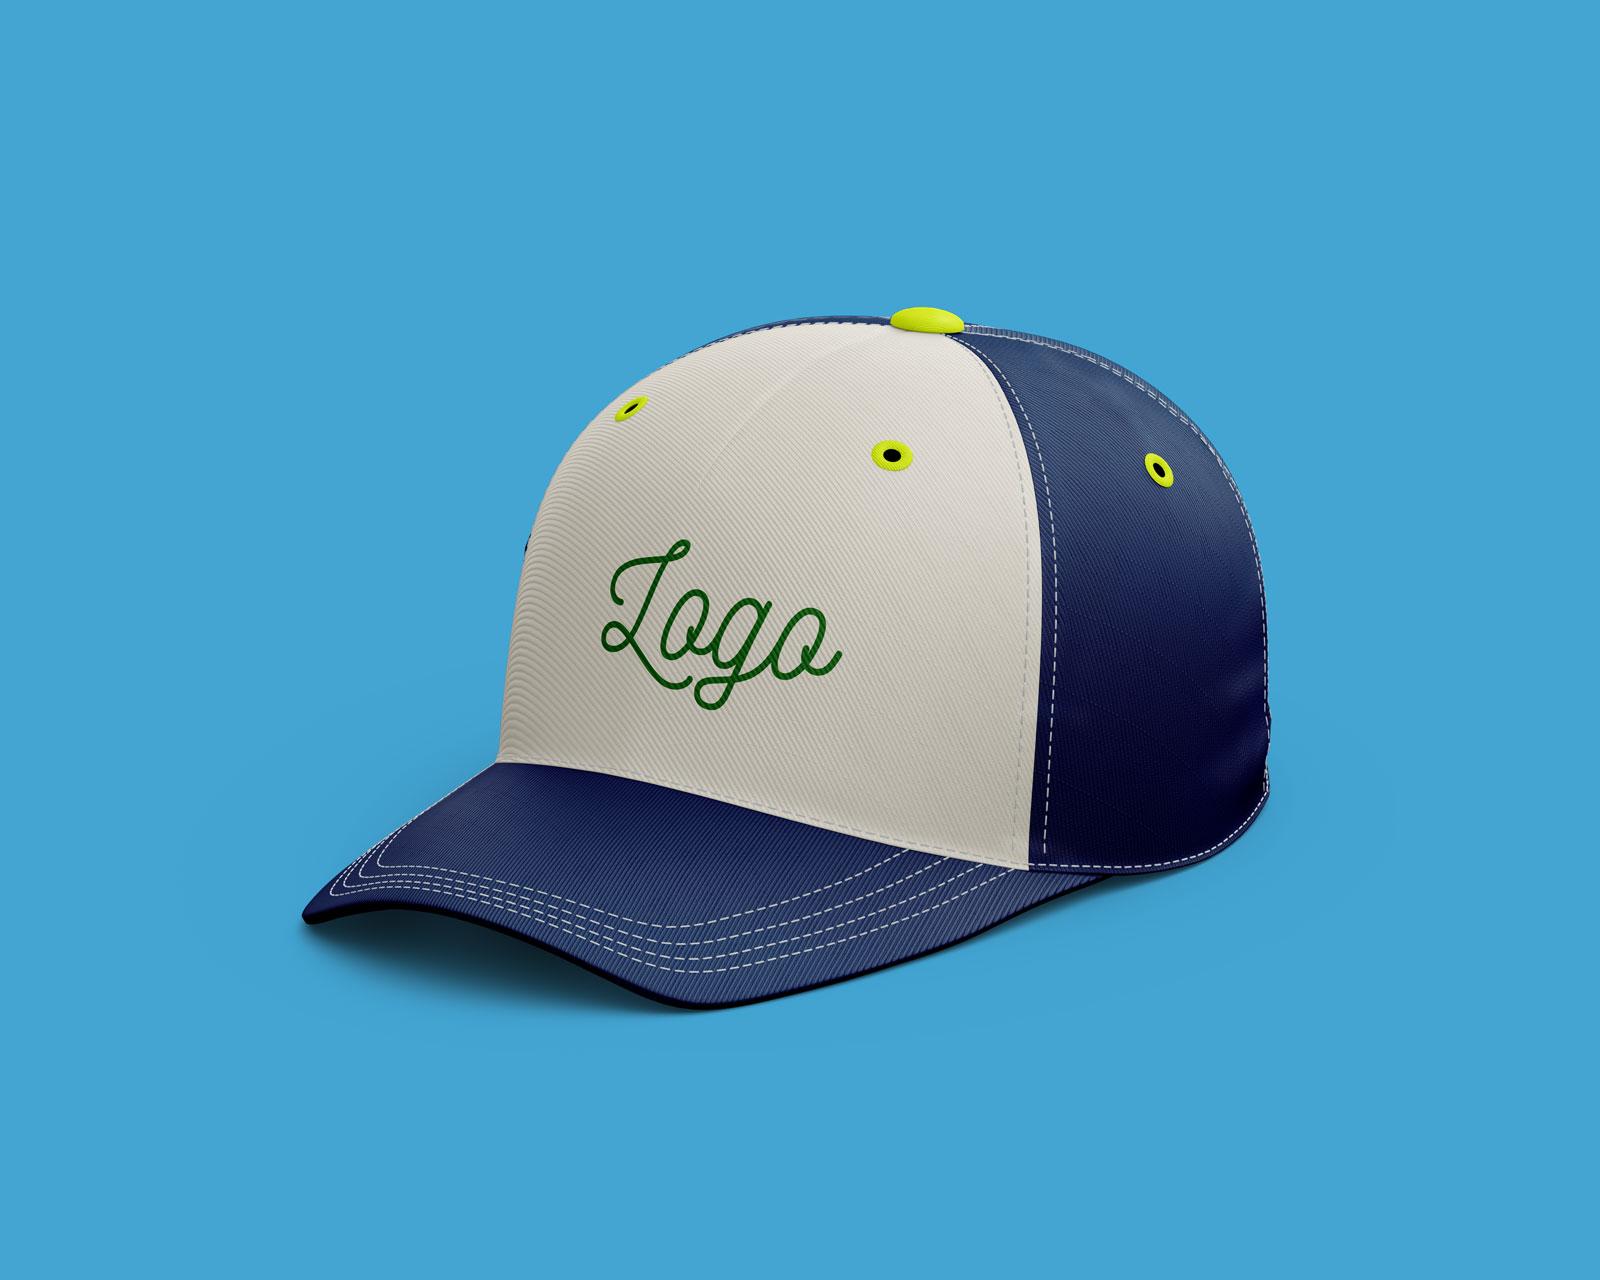 Free-Baseball-P-Cap-Mockup-PSD-File